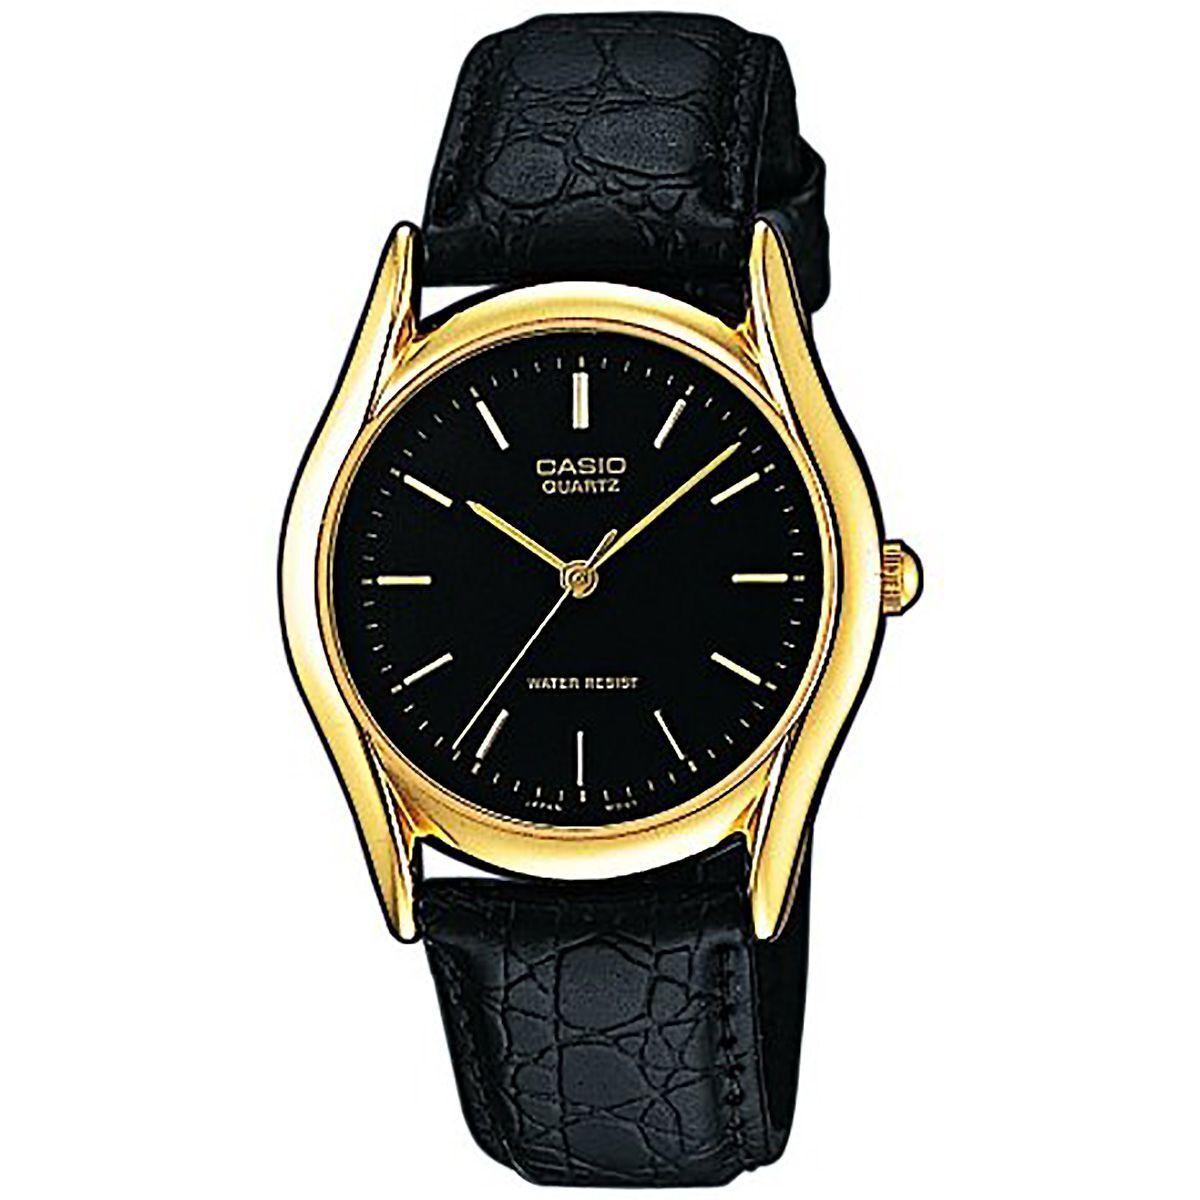 Casio Uhr MTP-1154PQ-1A Herren Armbanduhr Leder Schwarz Gold Watch Men NEU & OVP